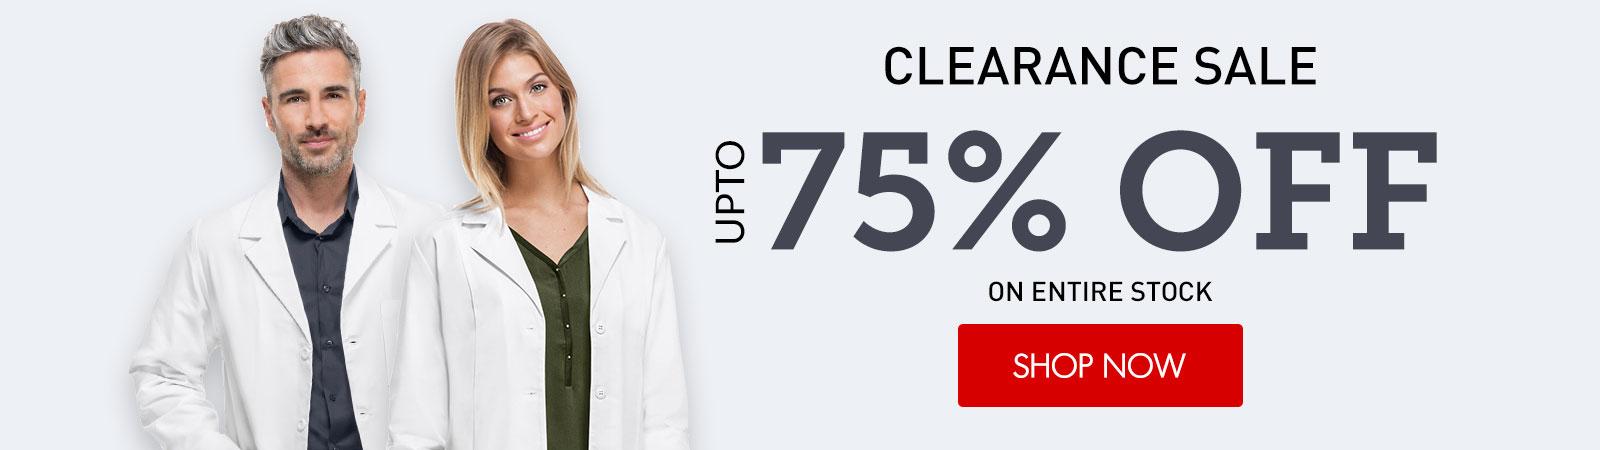 clearance lab coats